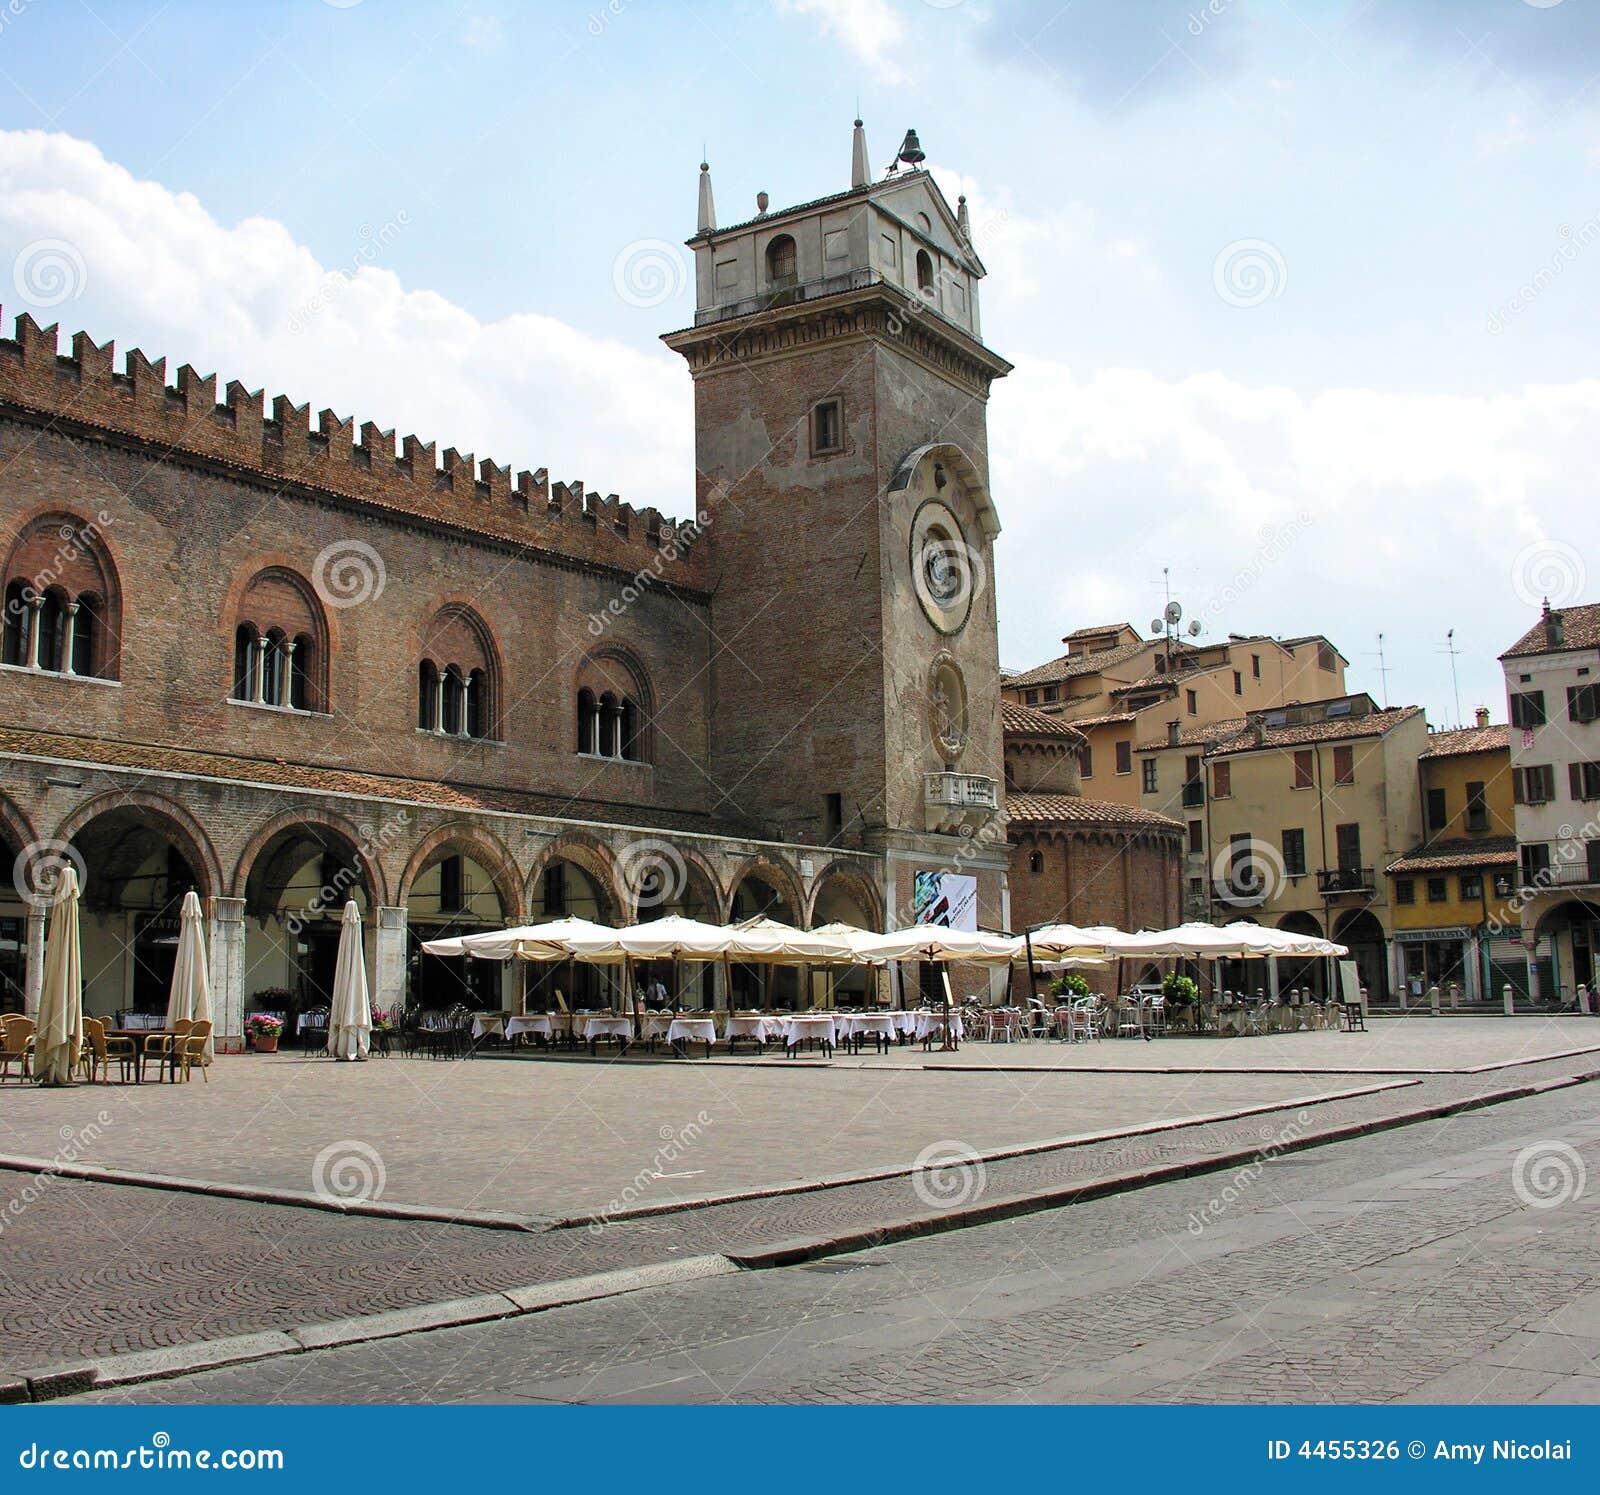 Courtyard cafe in Mantova